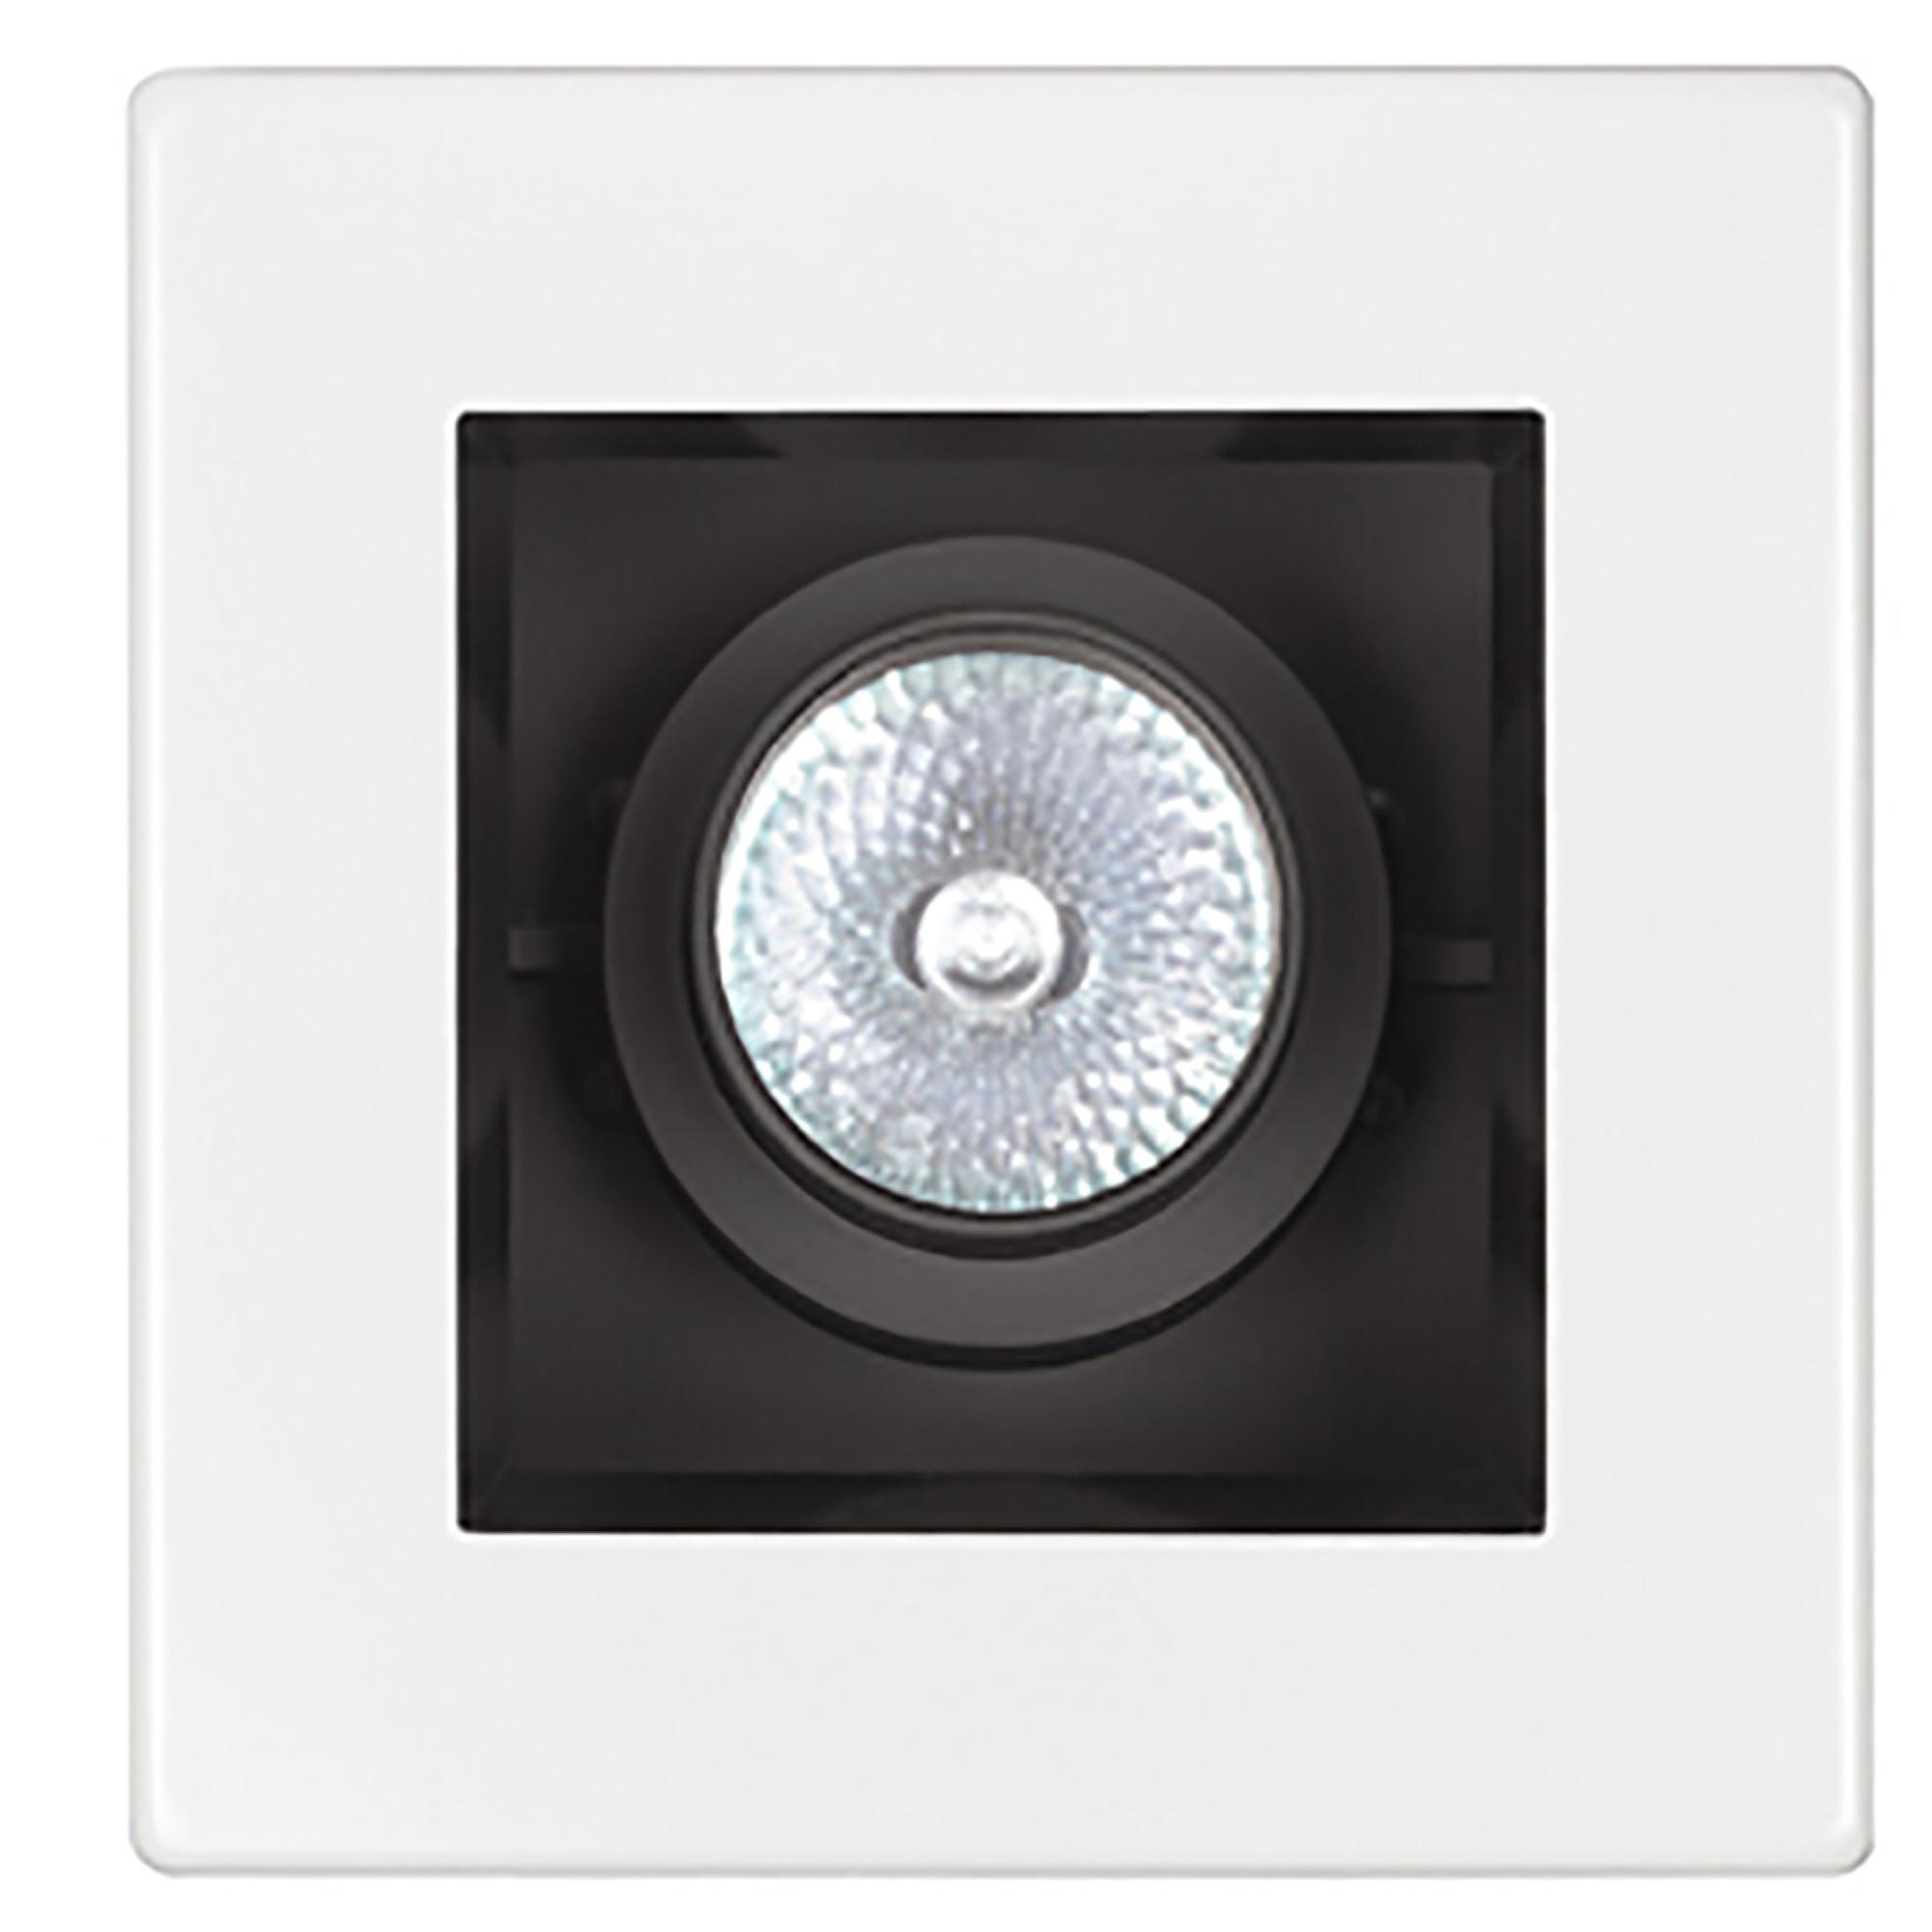 Details About Capri Lighting 4 Square Trim Lc134 Adjule Gimbal White Recessed